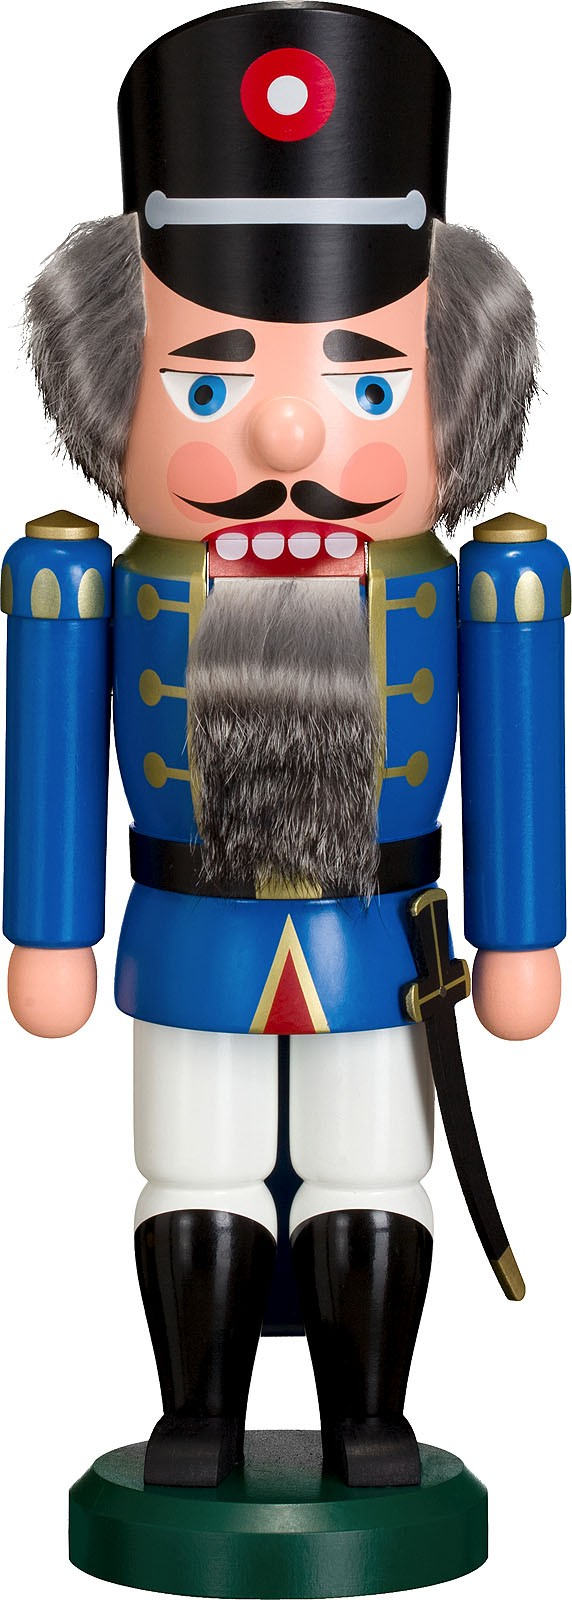 Nussknacker Polizist, blau, 35 cm